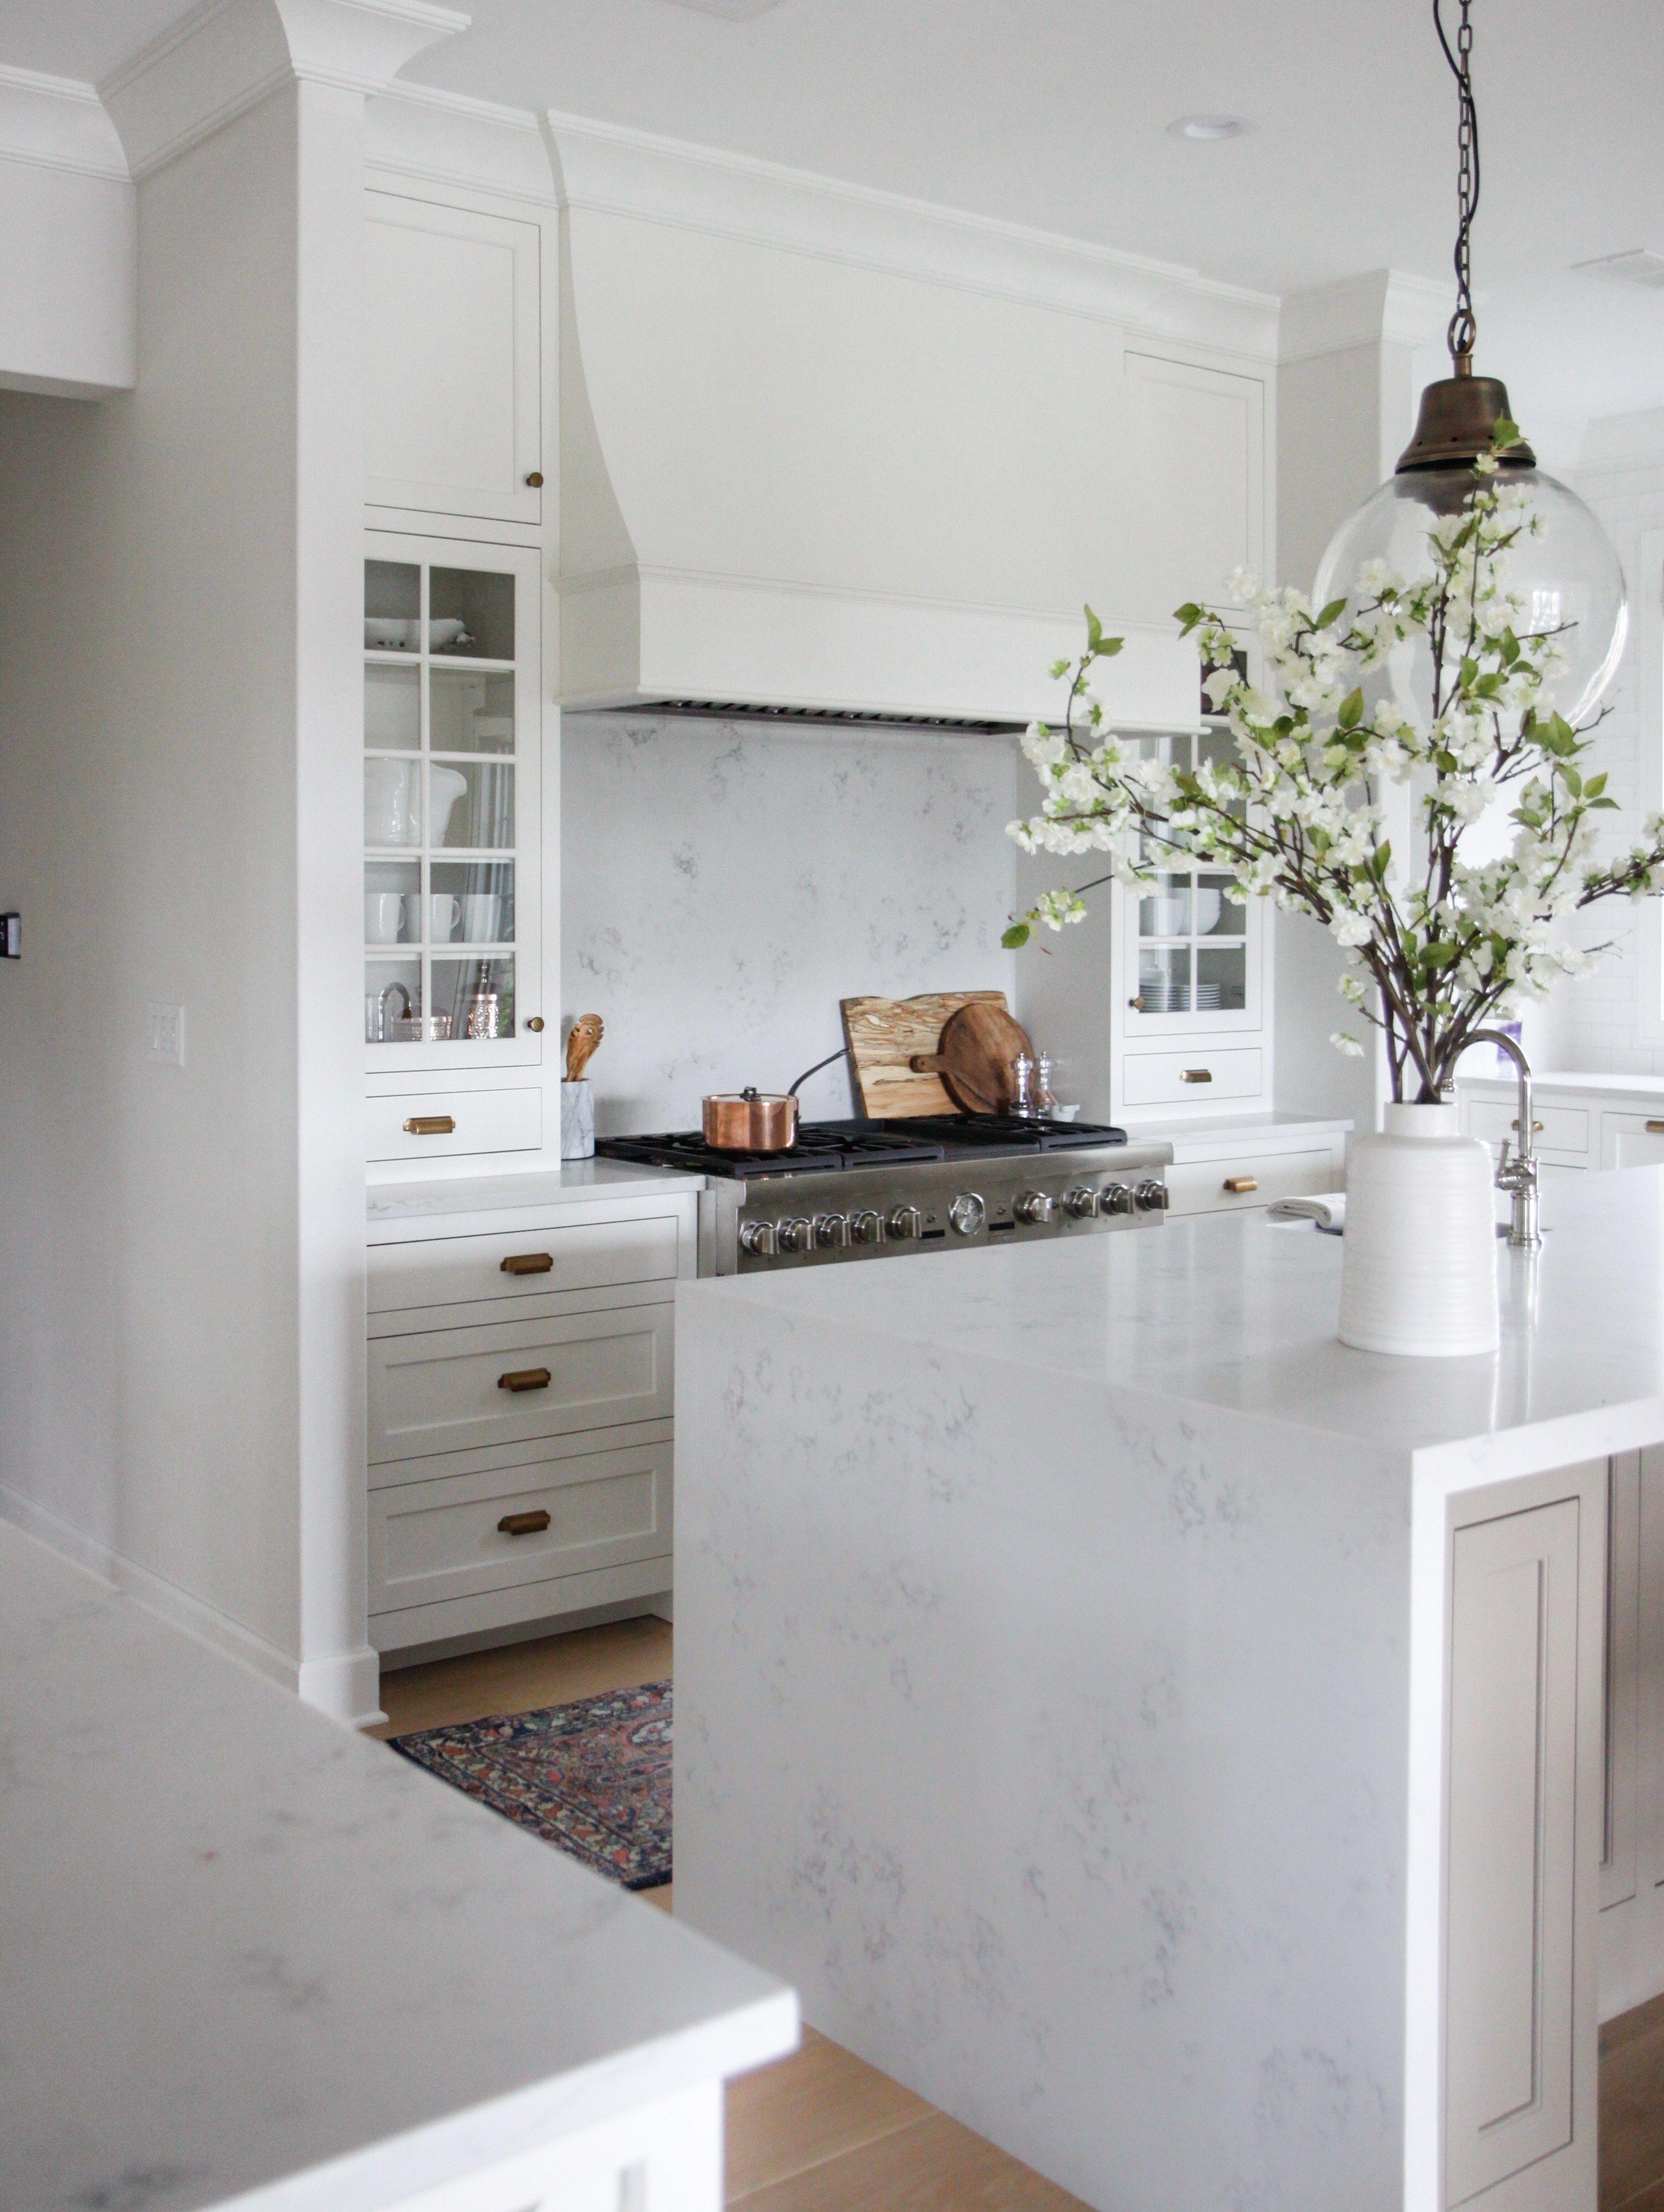 Favorite Brass Hardware Park And Oak Interior Design Interior Design Kitchen Kitchen Interior Kitchen Design